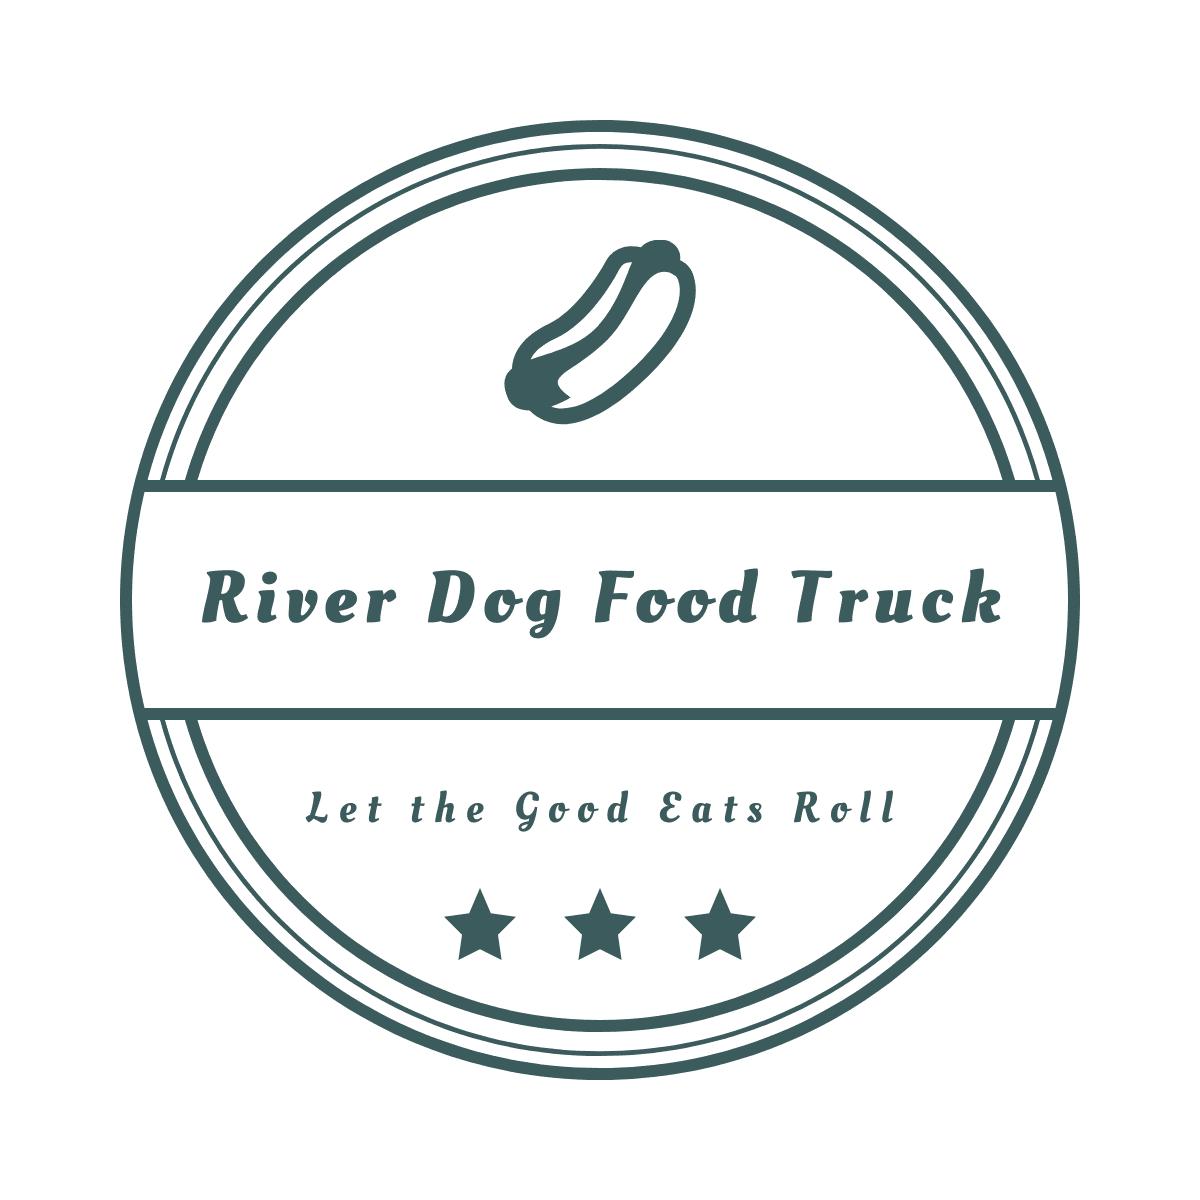 River Dog Food Truck